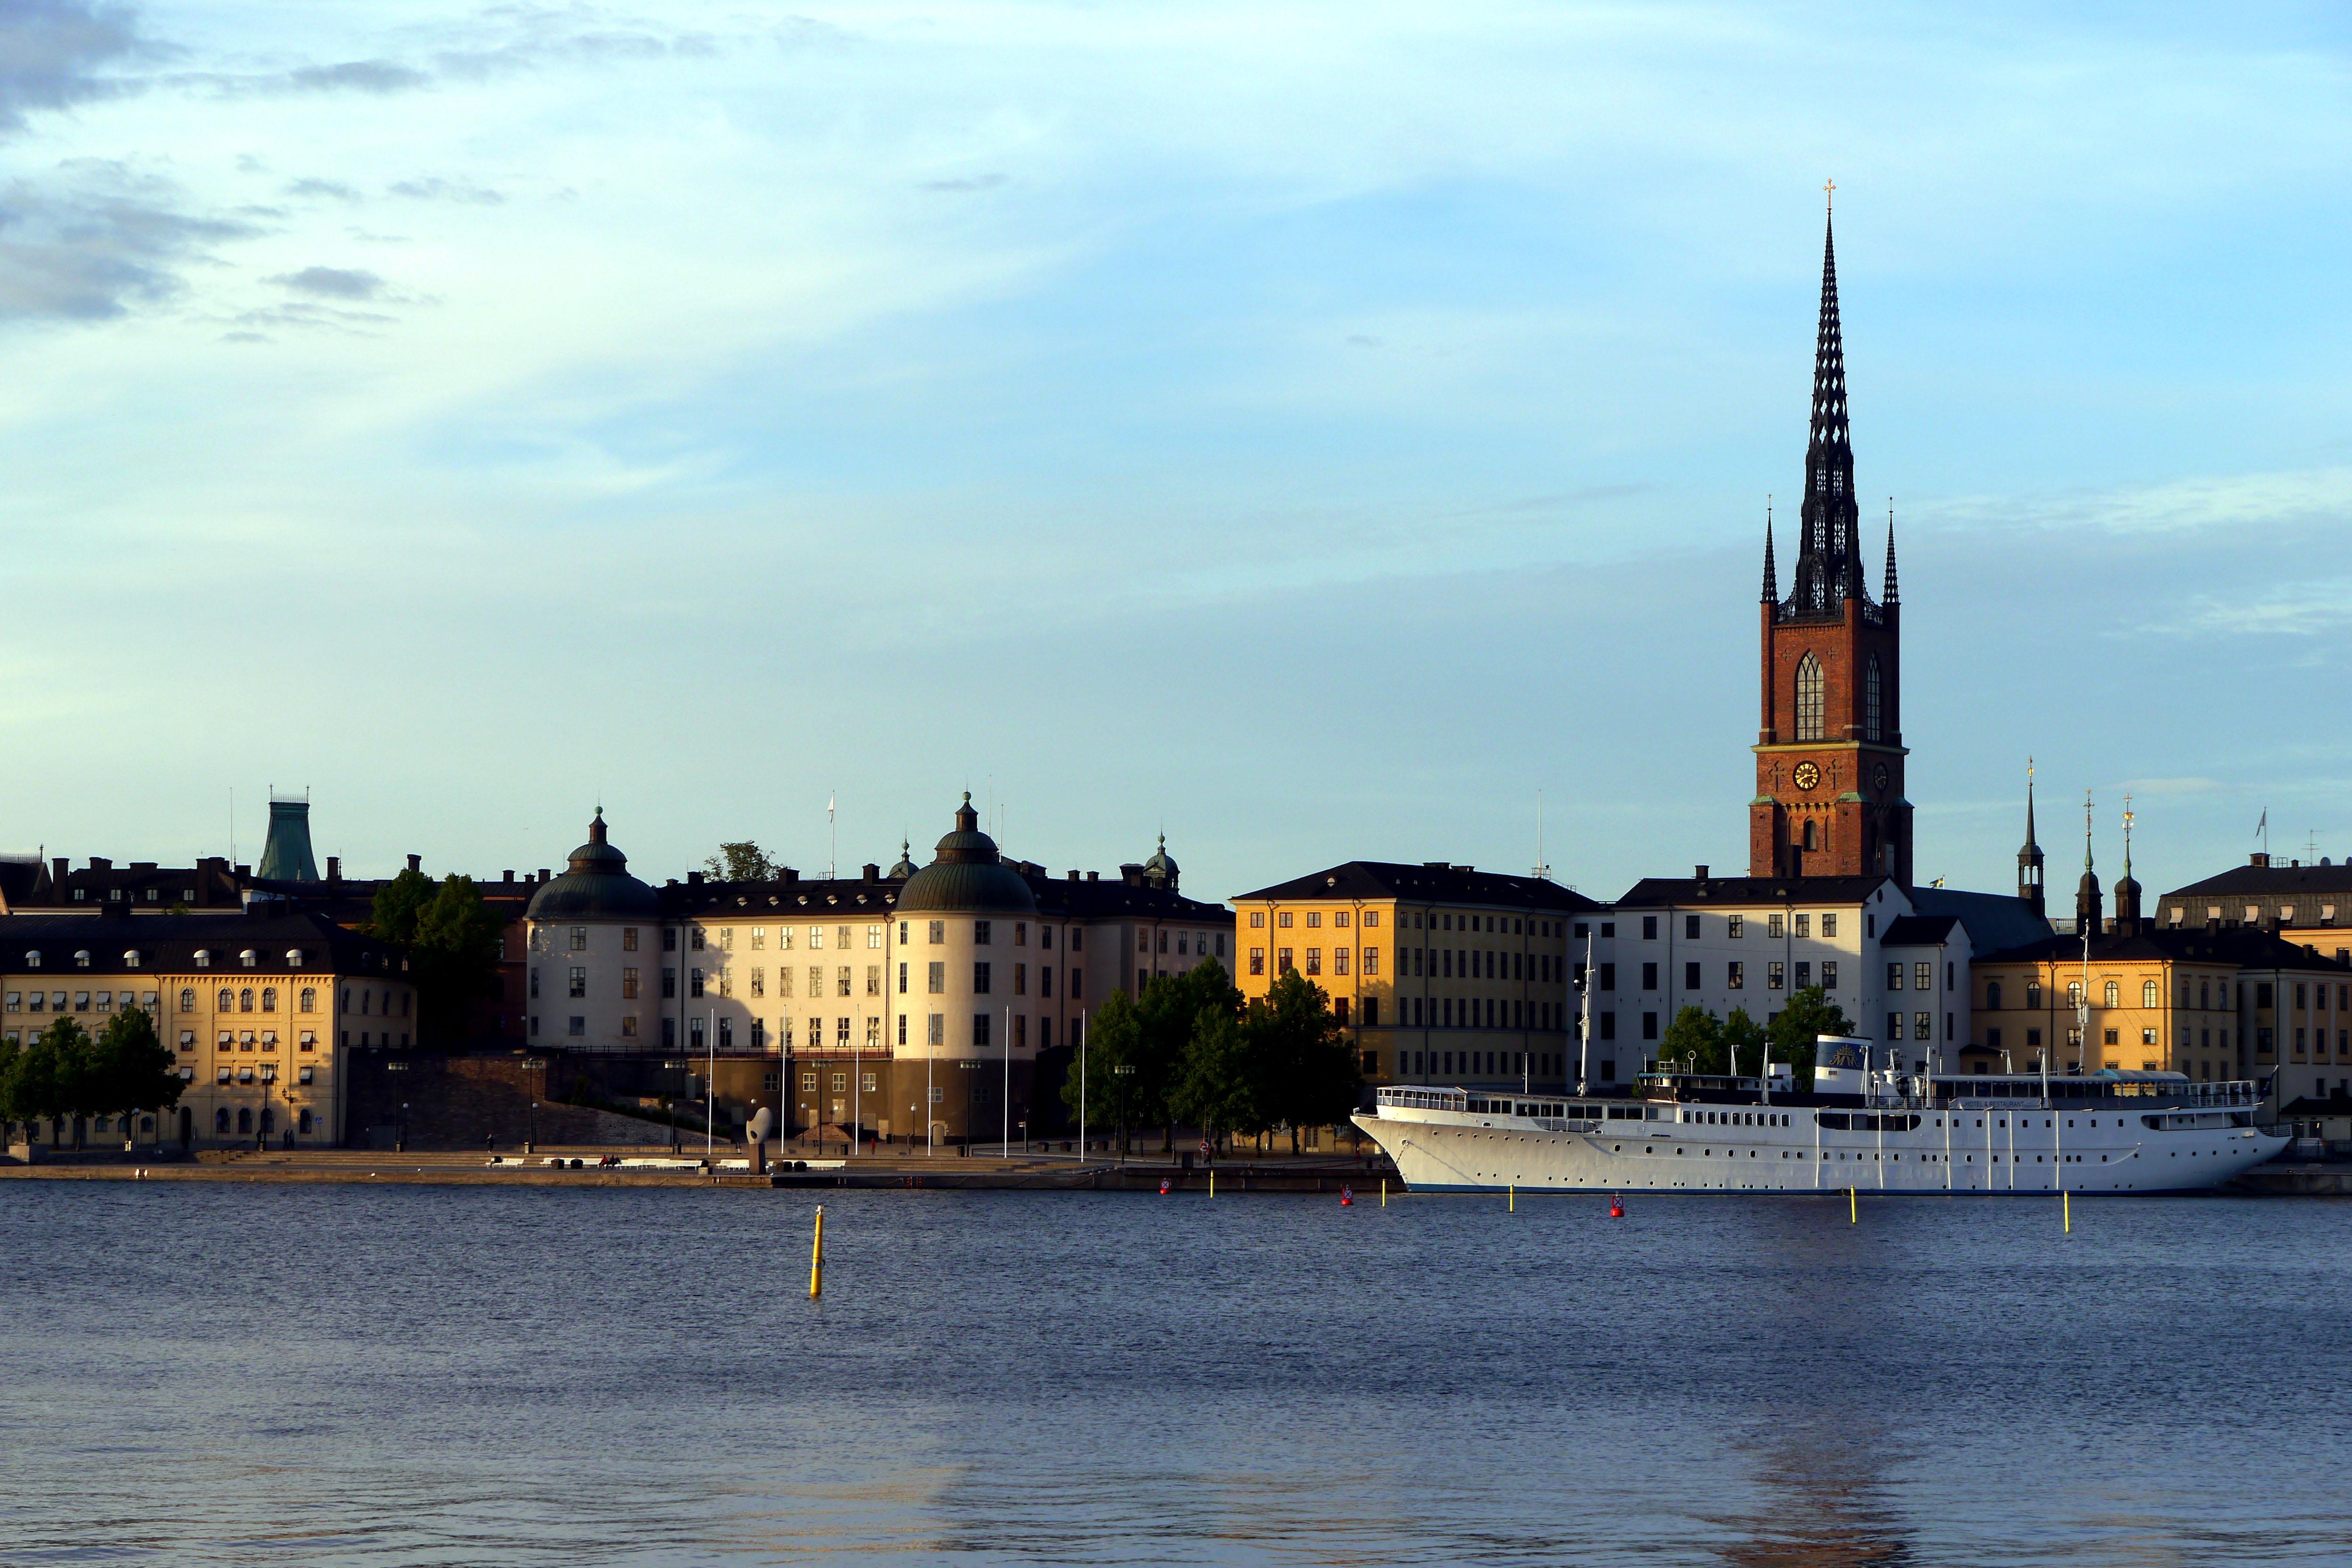 Stockholm-Riddarholmen-Schweden